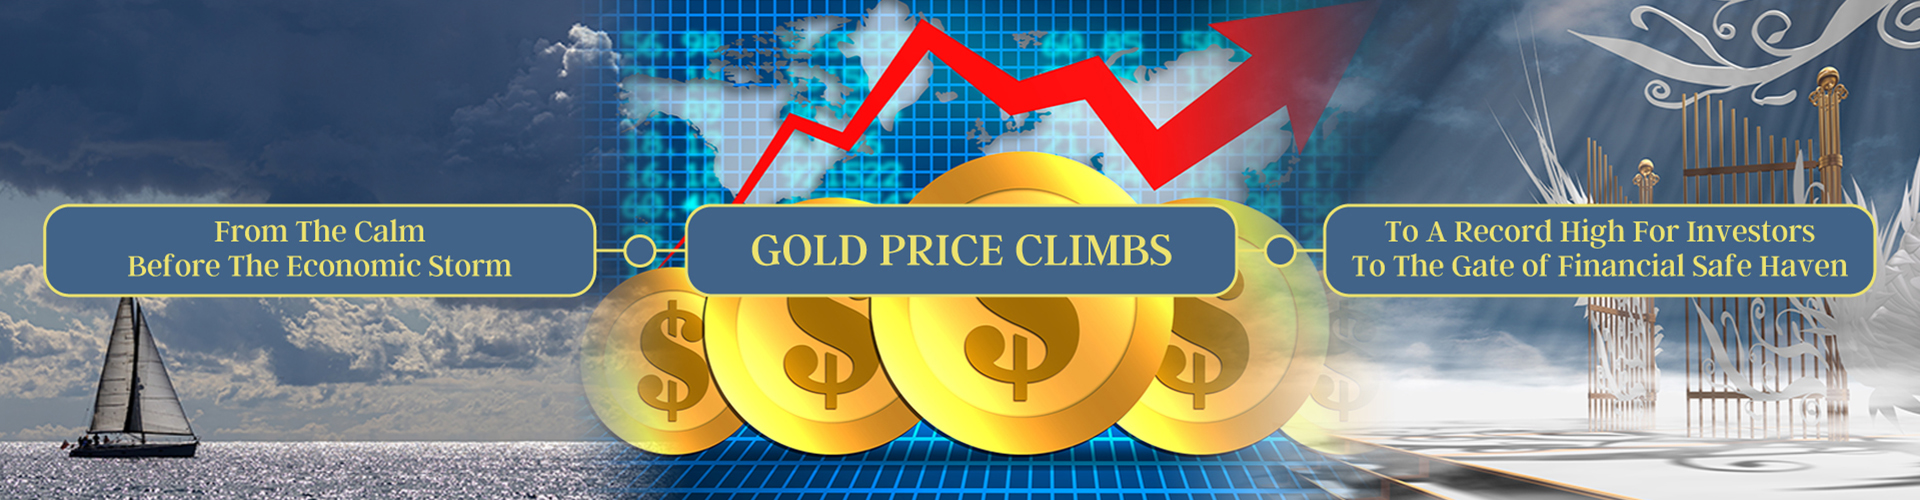 Gold Price Climbs Record high